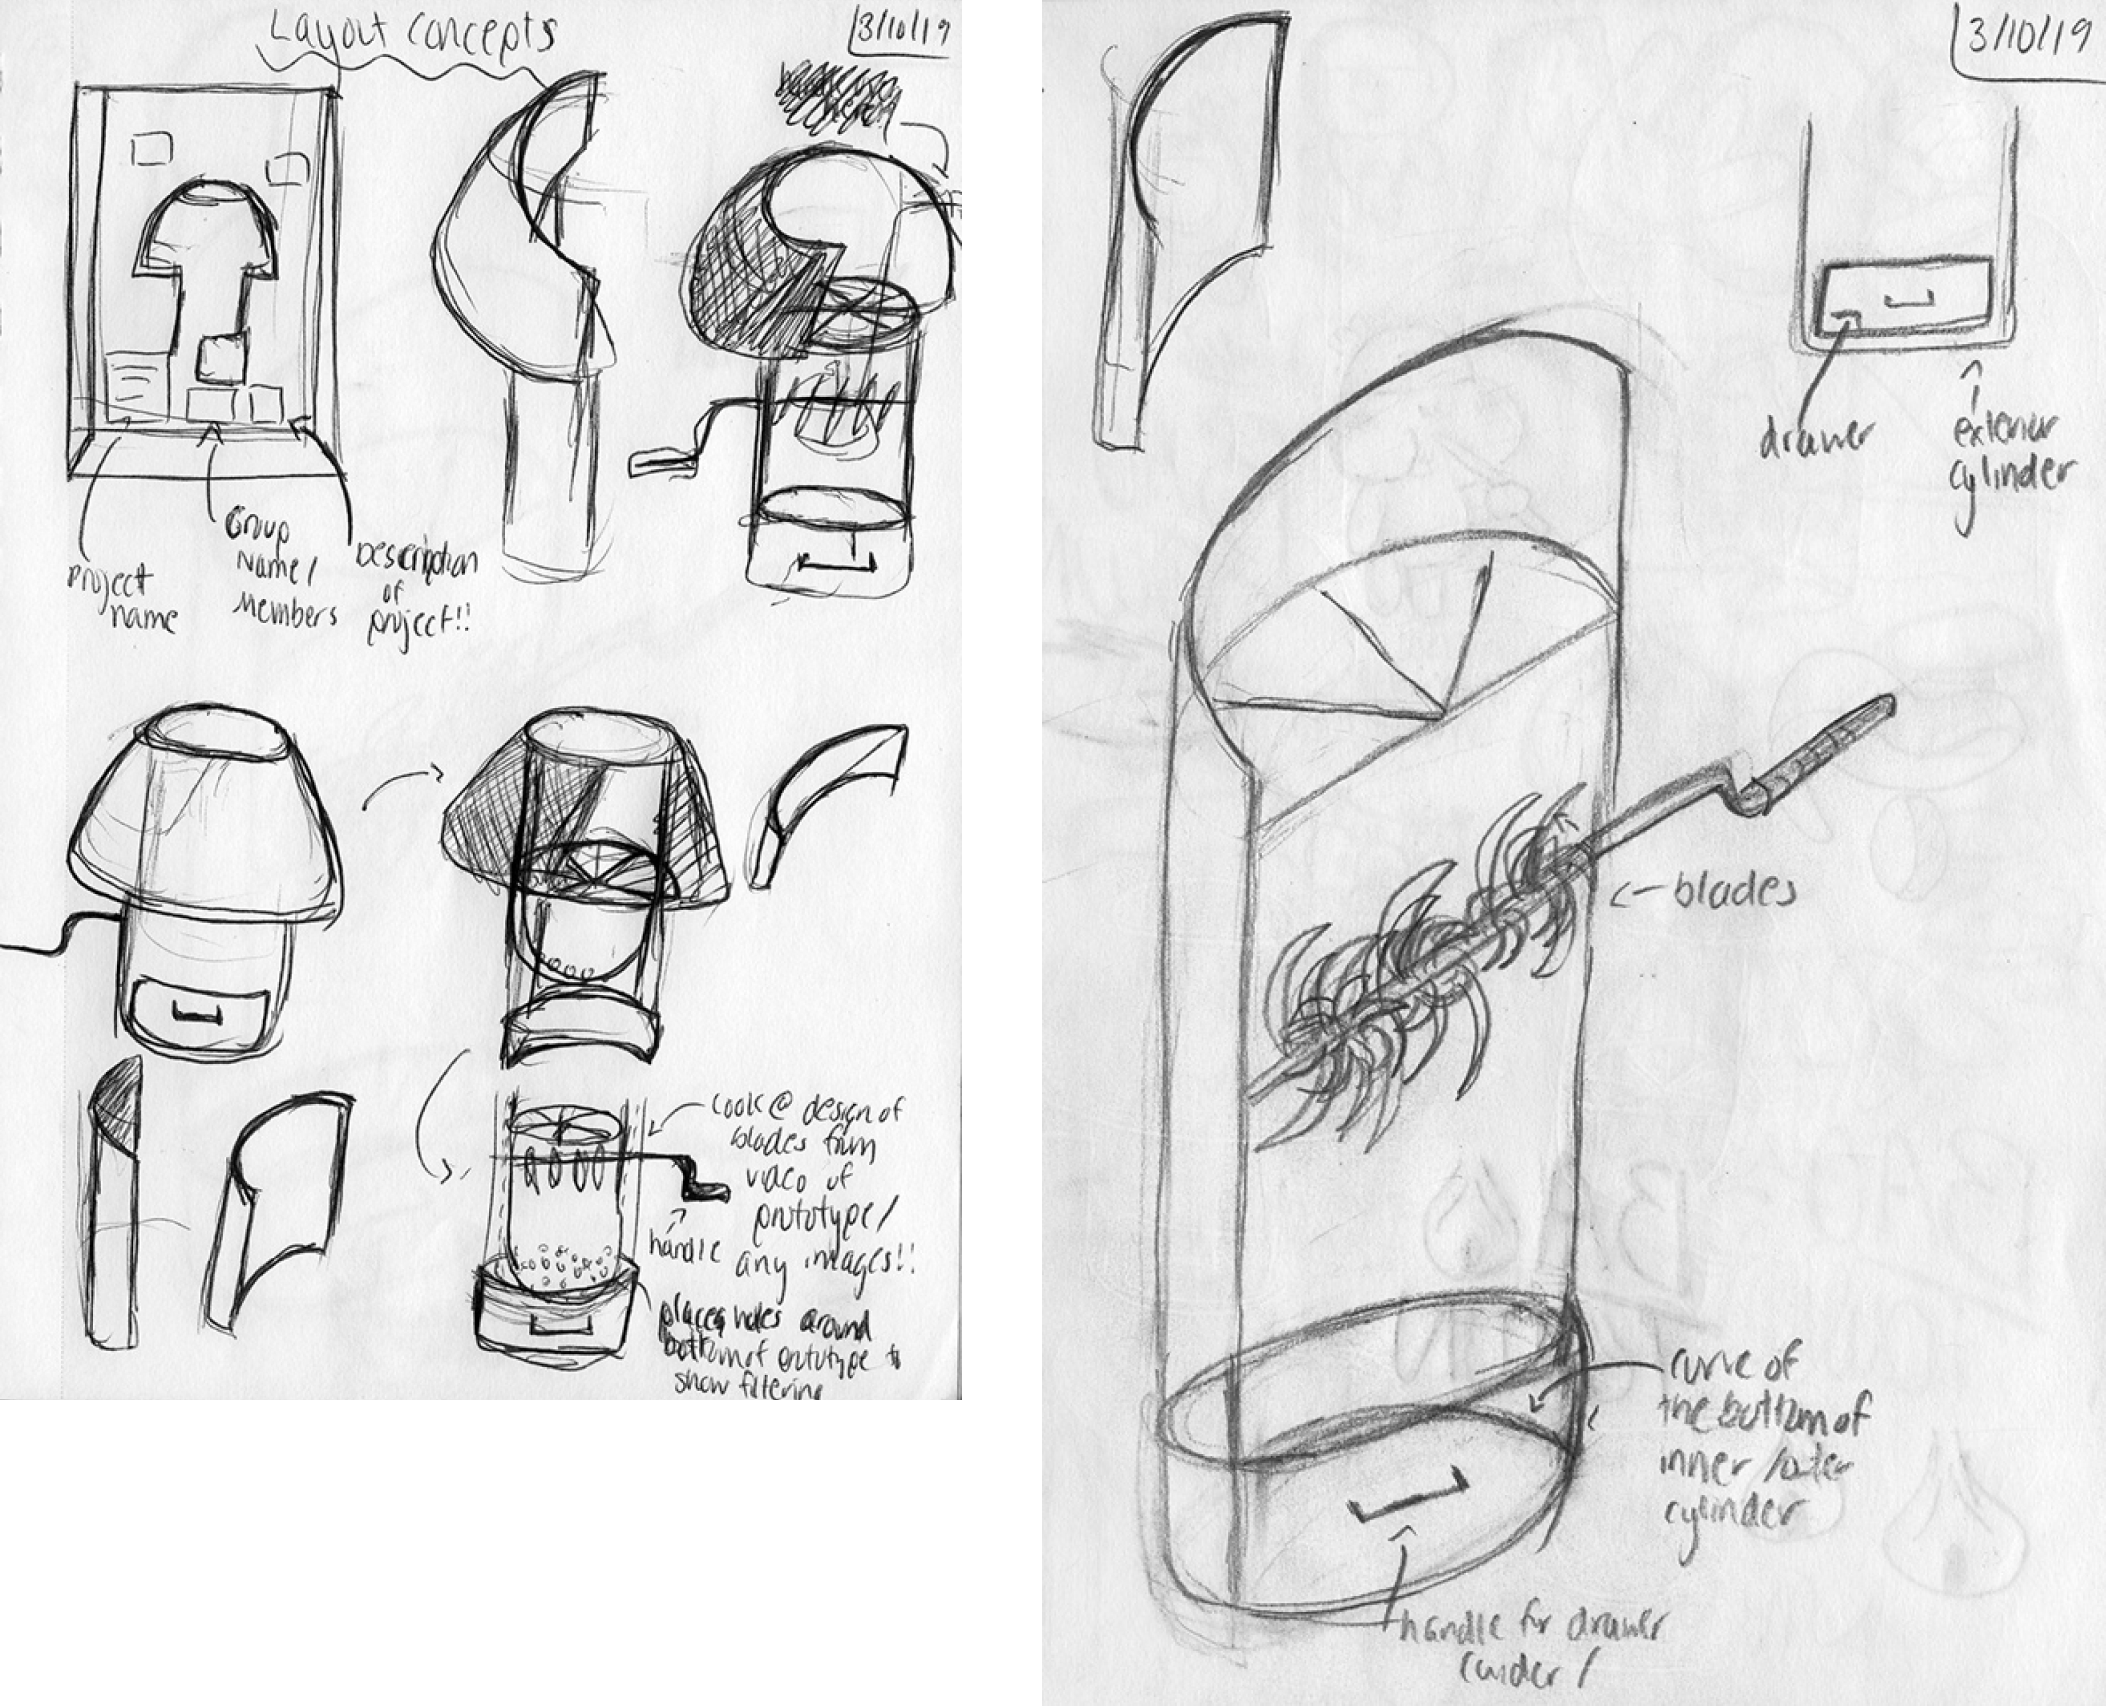 Rough sketches to build exhibition model